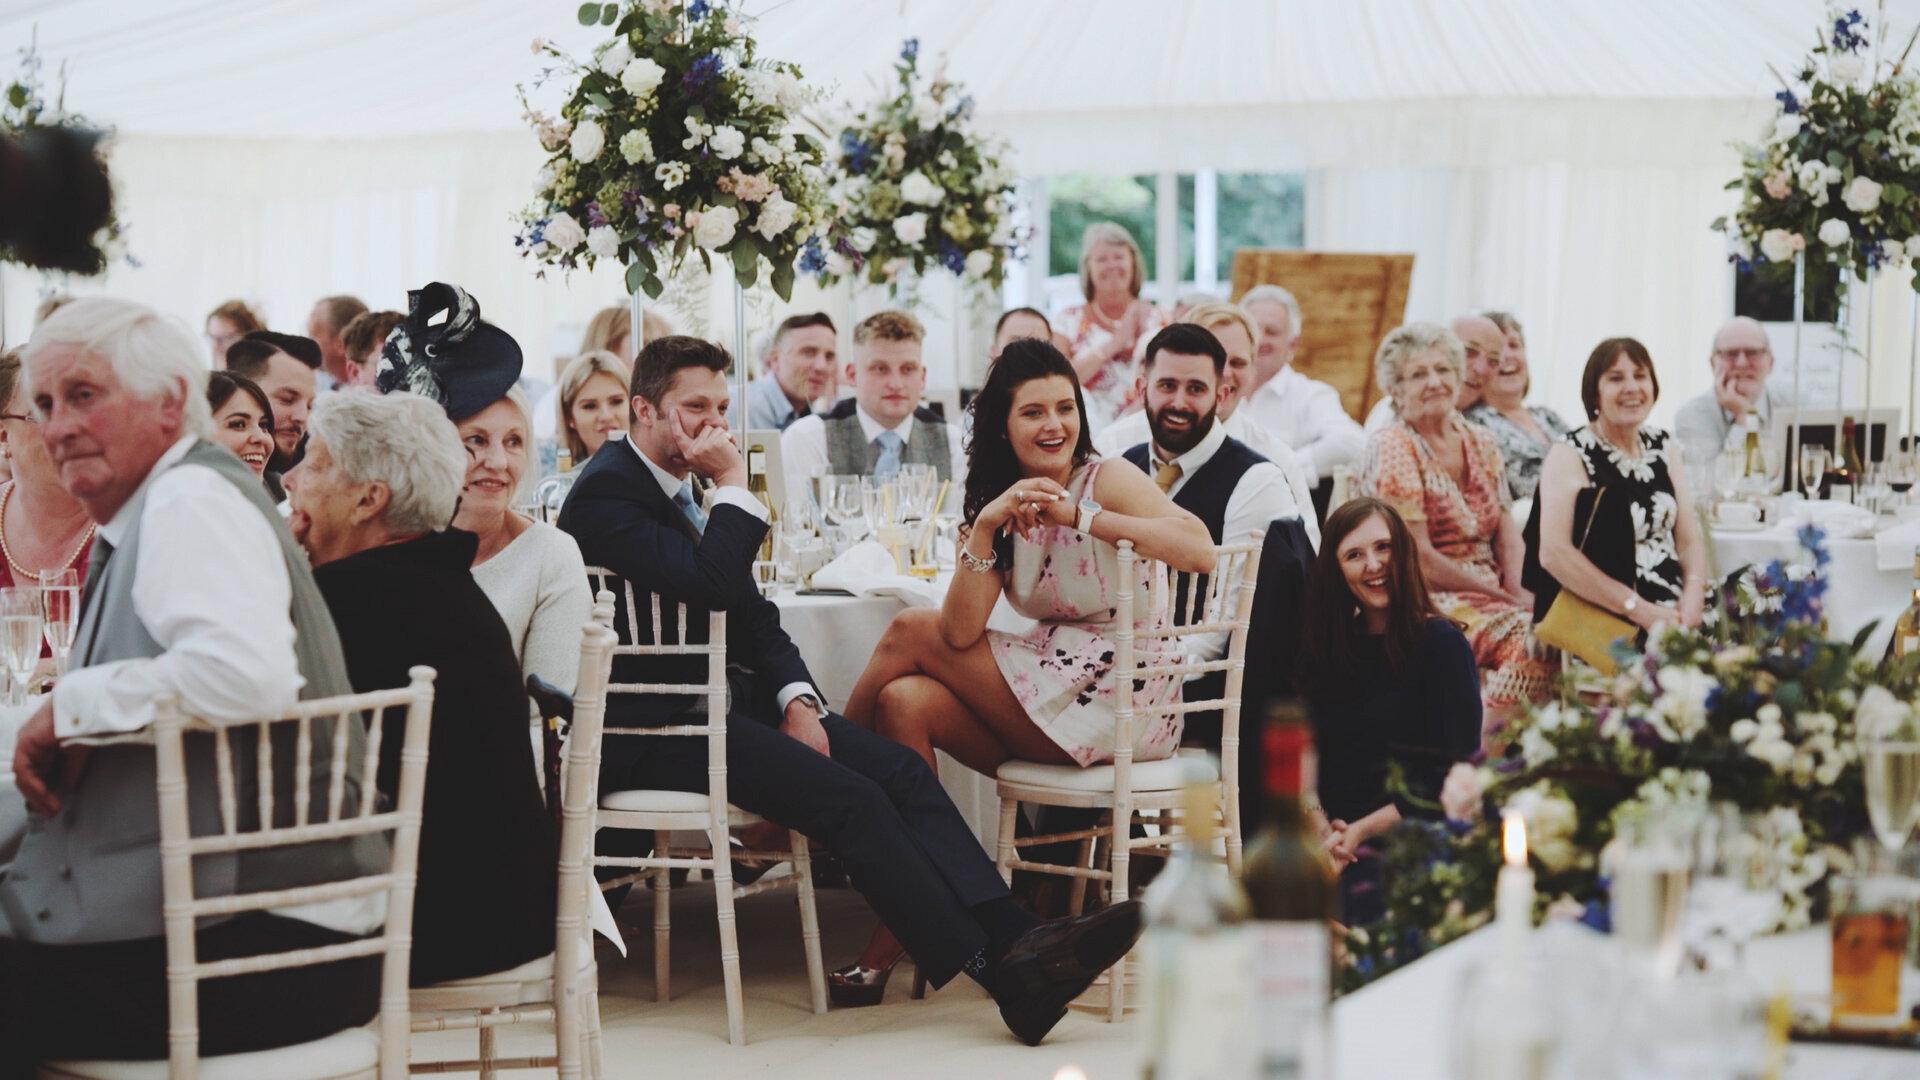 Rachel & Sam - Stills - Context Weddings83.jpg